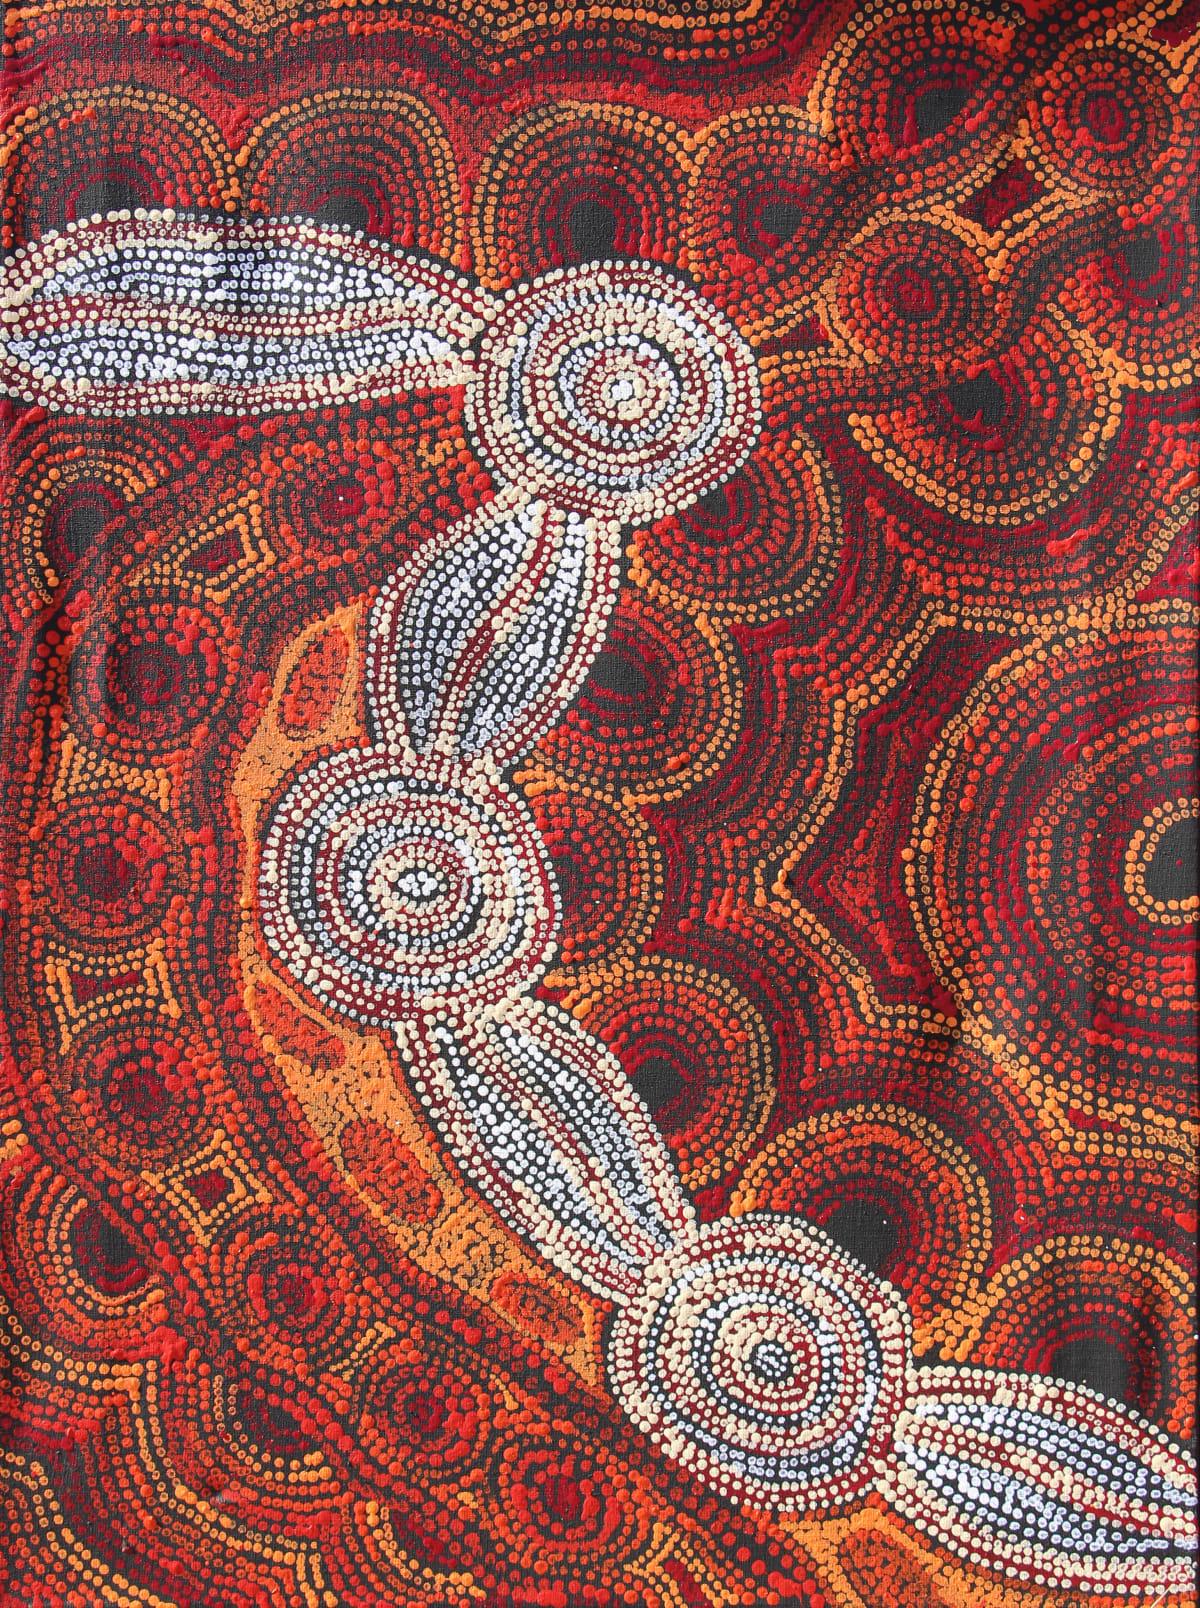 Rosalind Tjanyari Ngura Kutti (Spirit Country), 2019 Acrylic on Linen 61 x 91cm